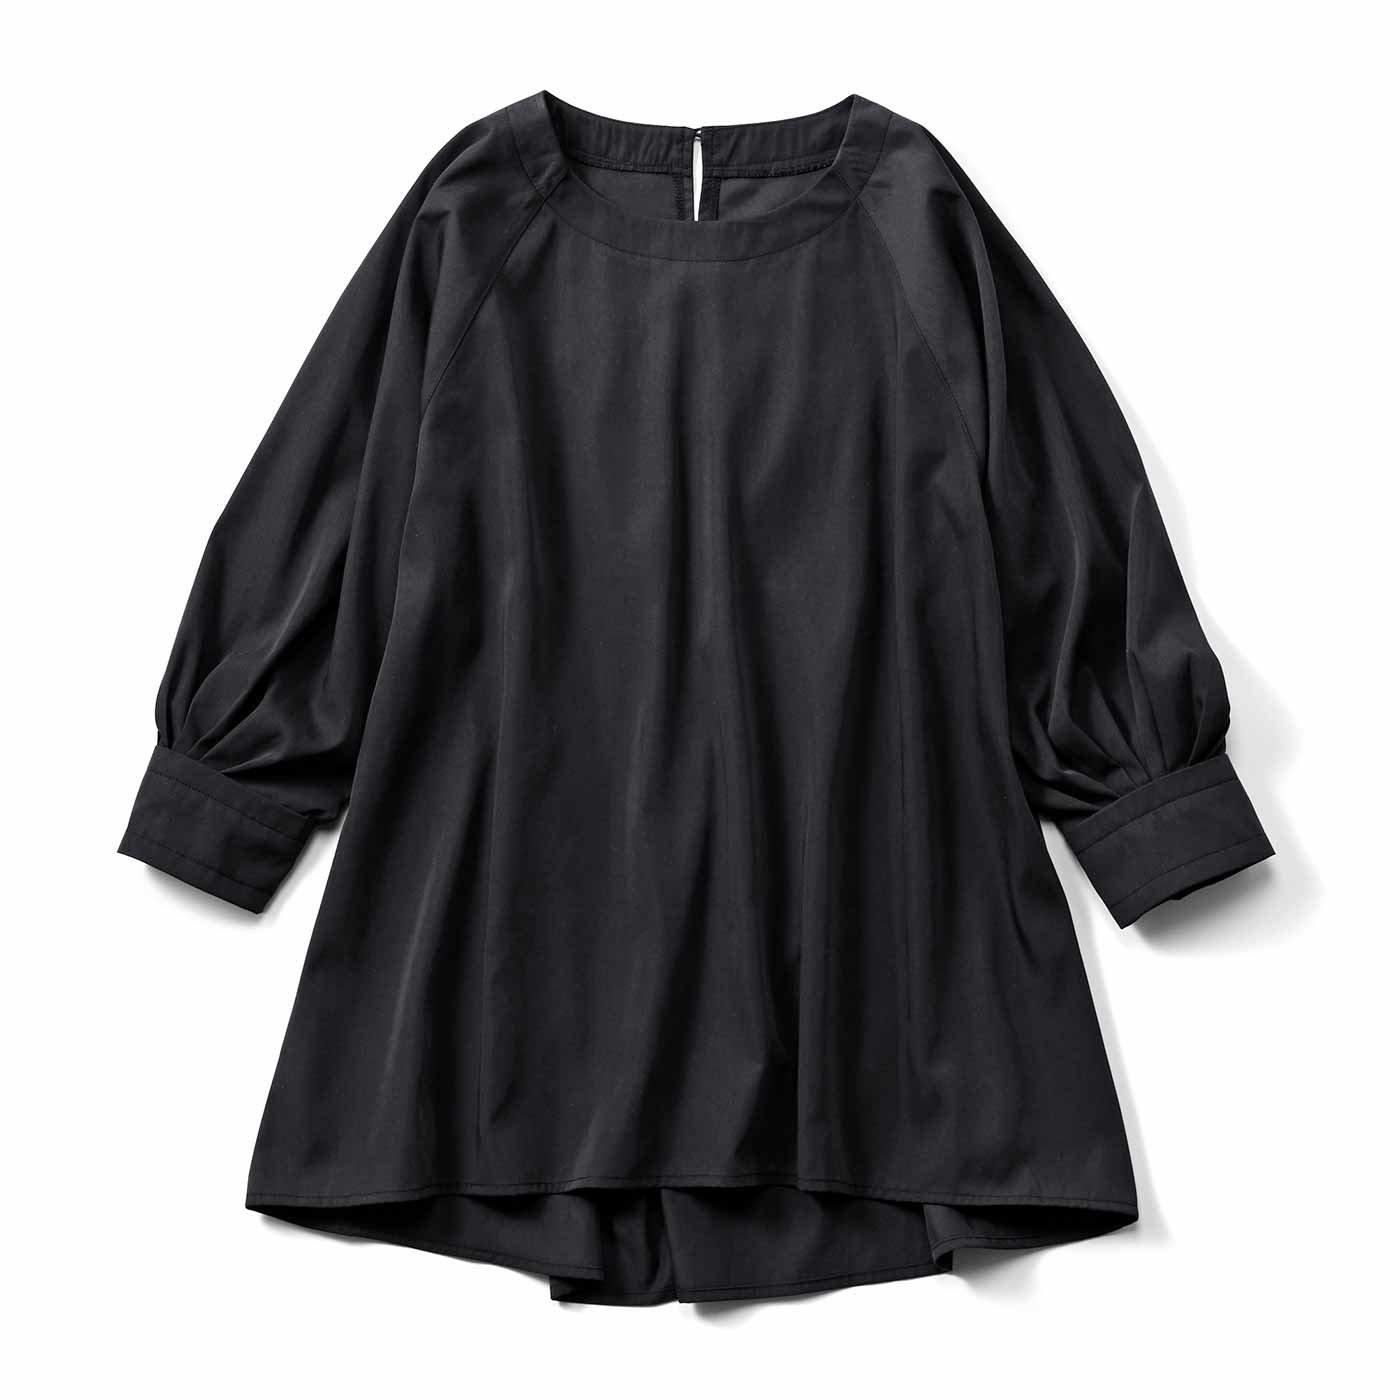 IEDIT[イディット] タックスリーブの着映えフレアートップス〈ブラック〉